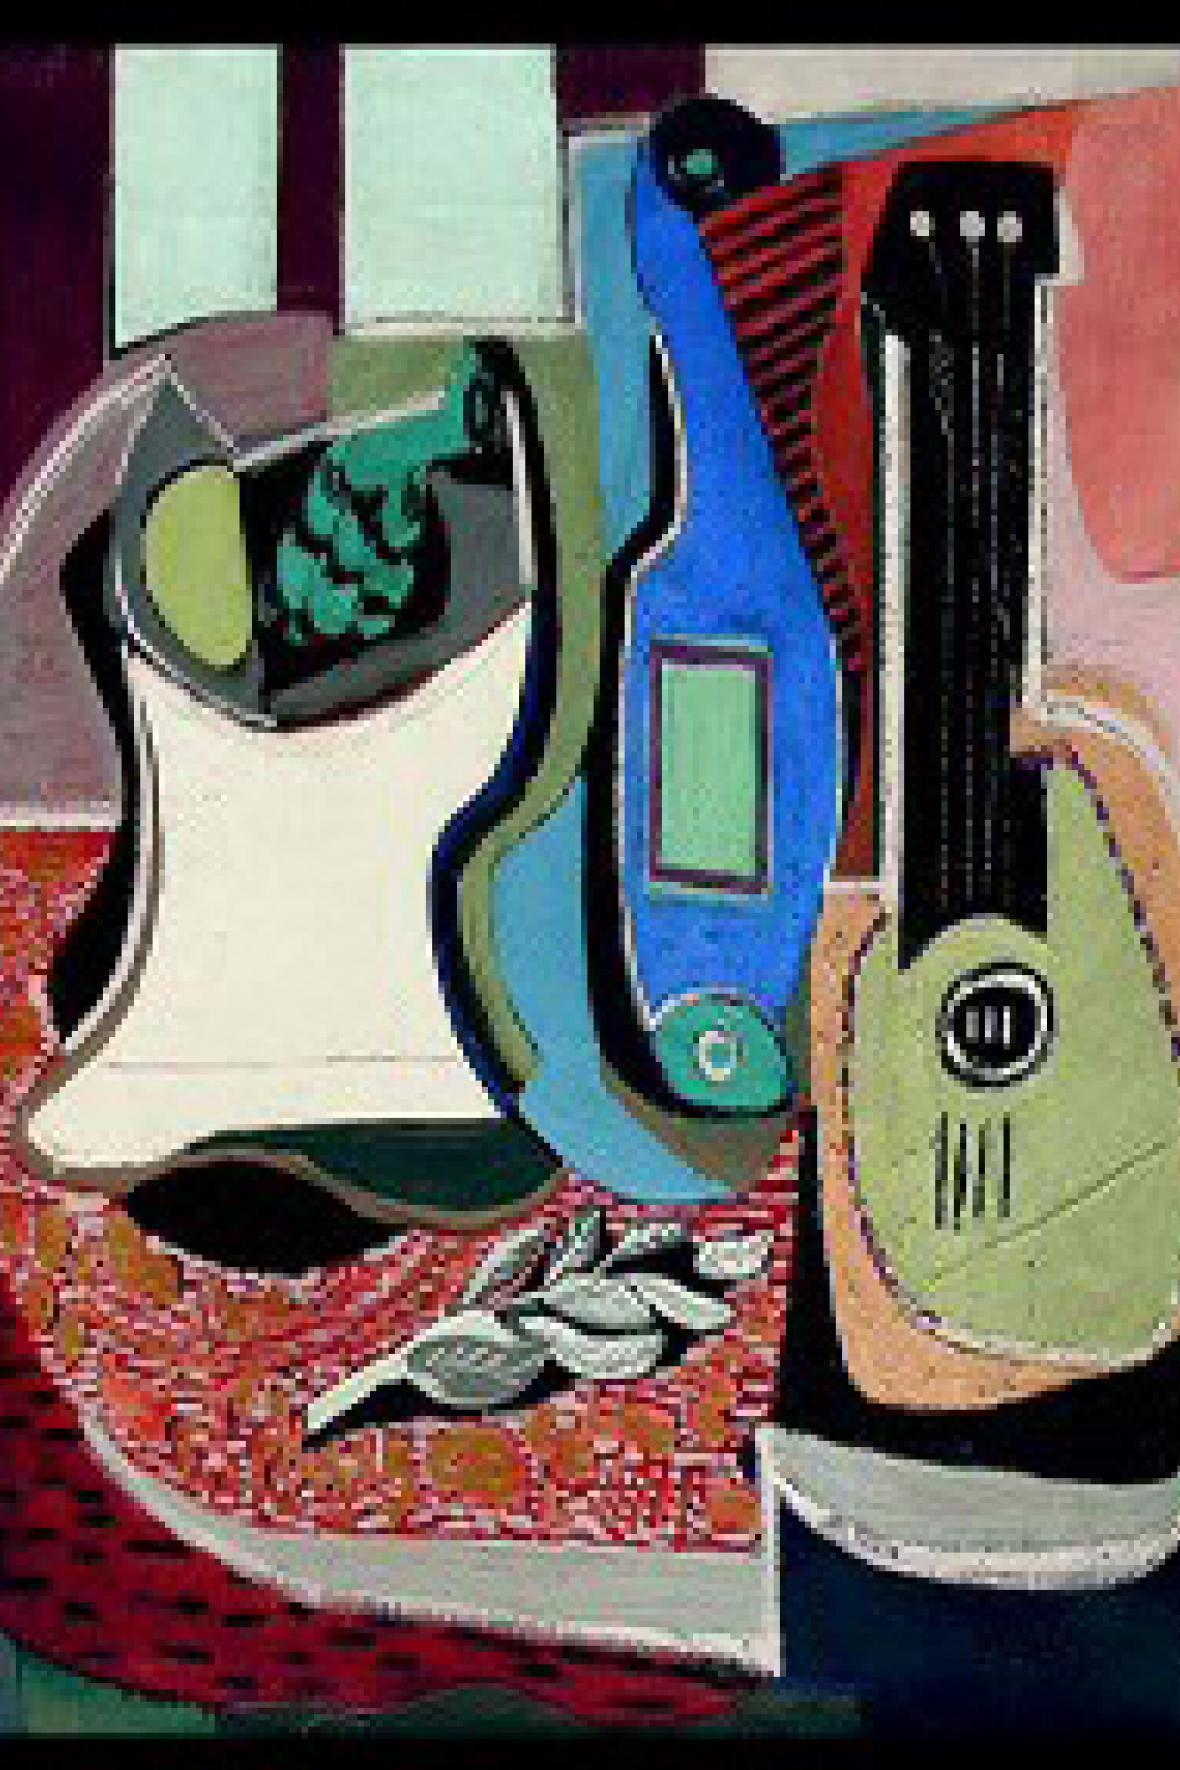 Zátiší s artyčokem a mandolínou